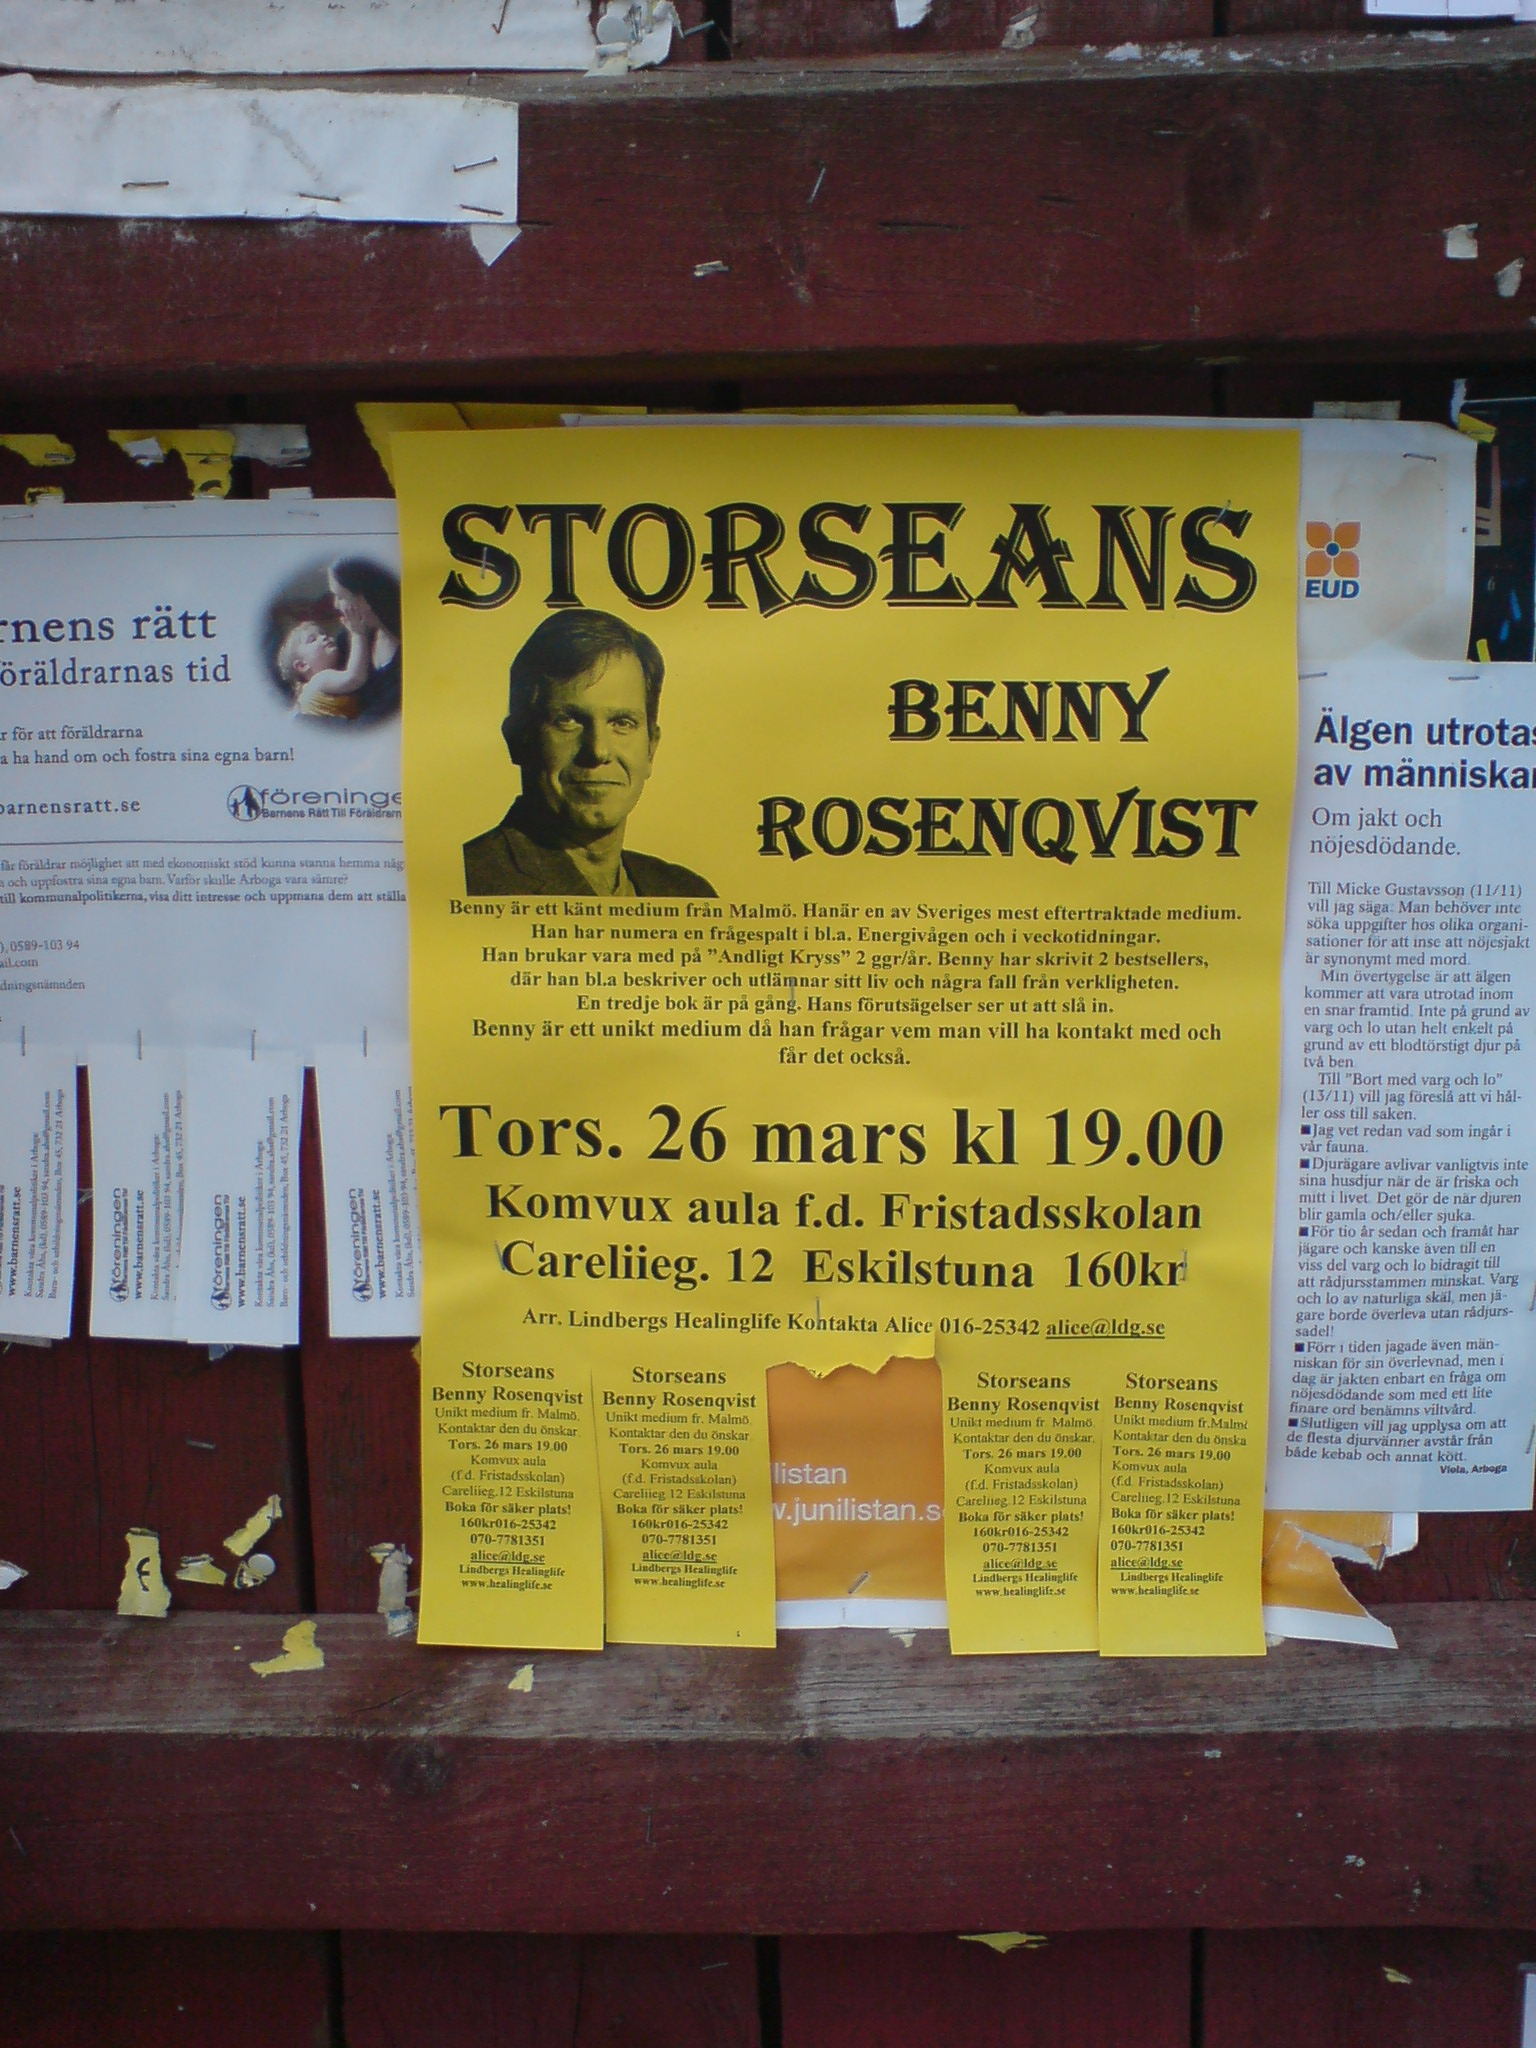 benny rosenqvist böcker